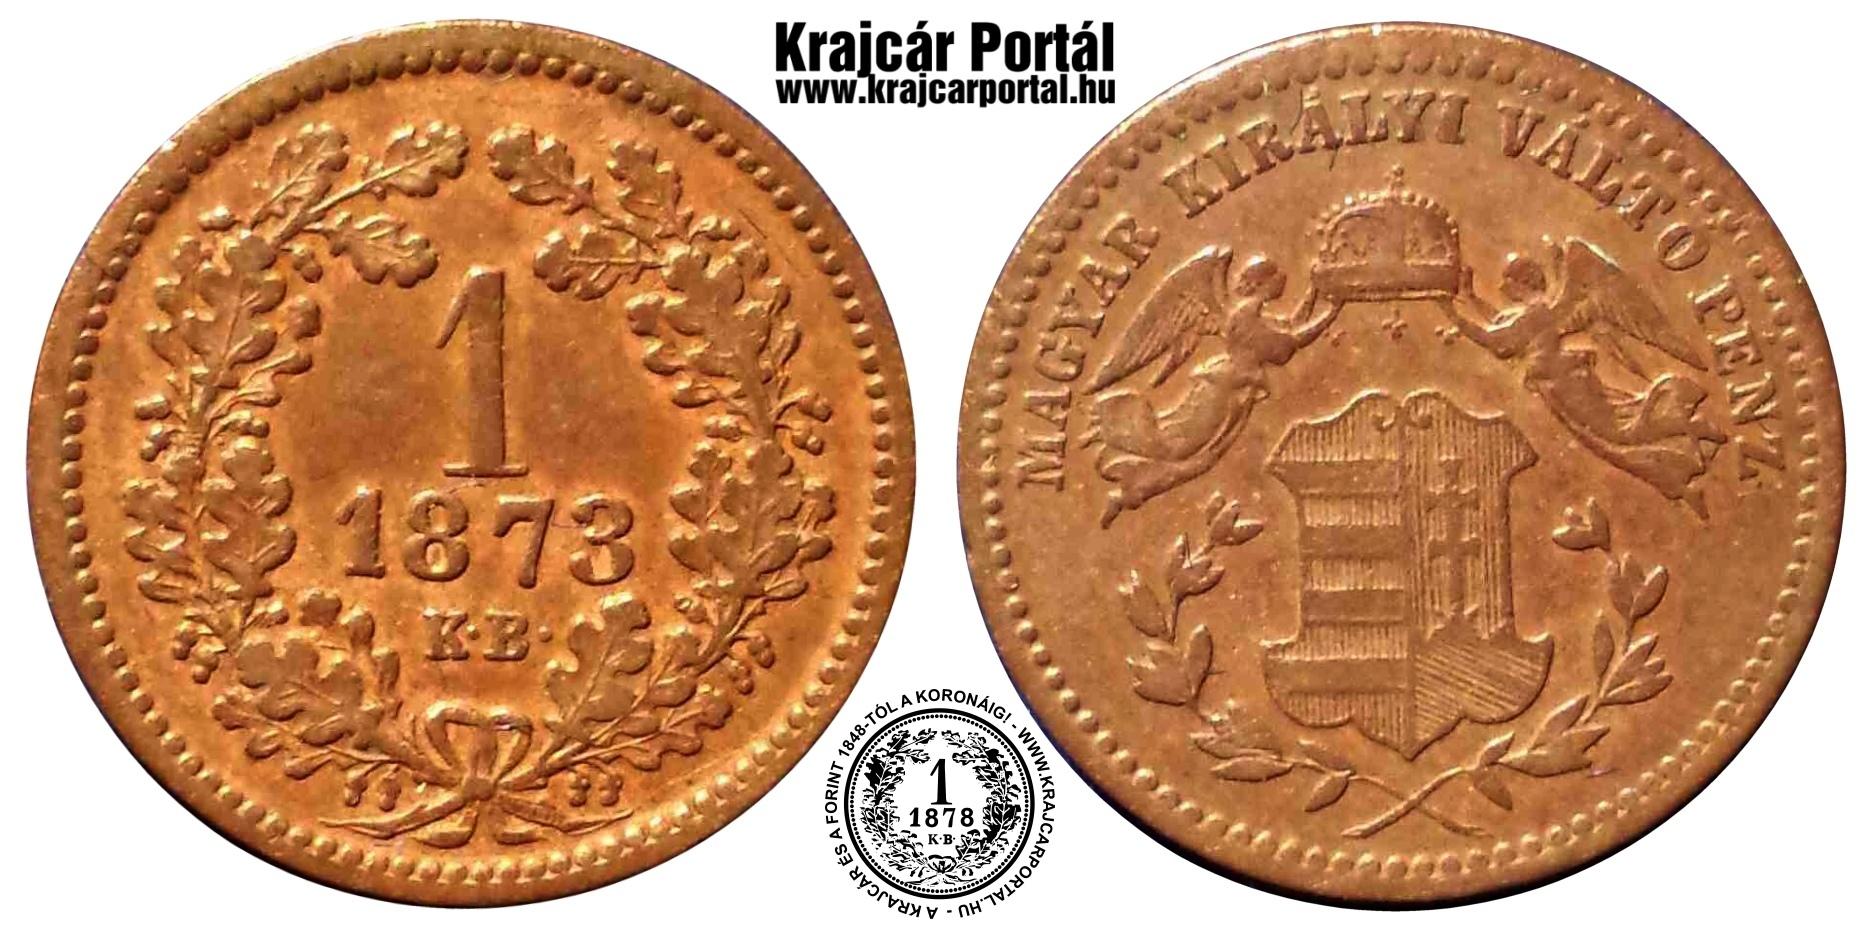 http://www.krajcarportal.hu/ferencjozsef/1_krajcar/www_krajcarportal_hu_1873_1_krajczar-krajcar.jpg